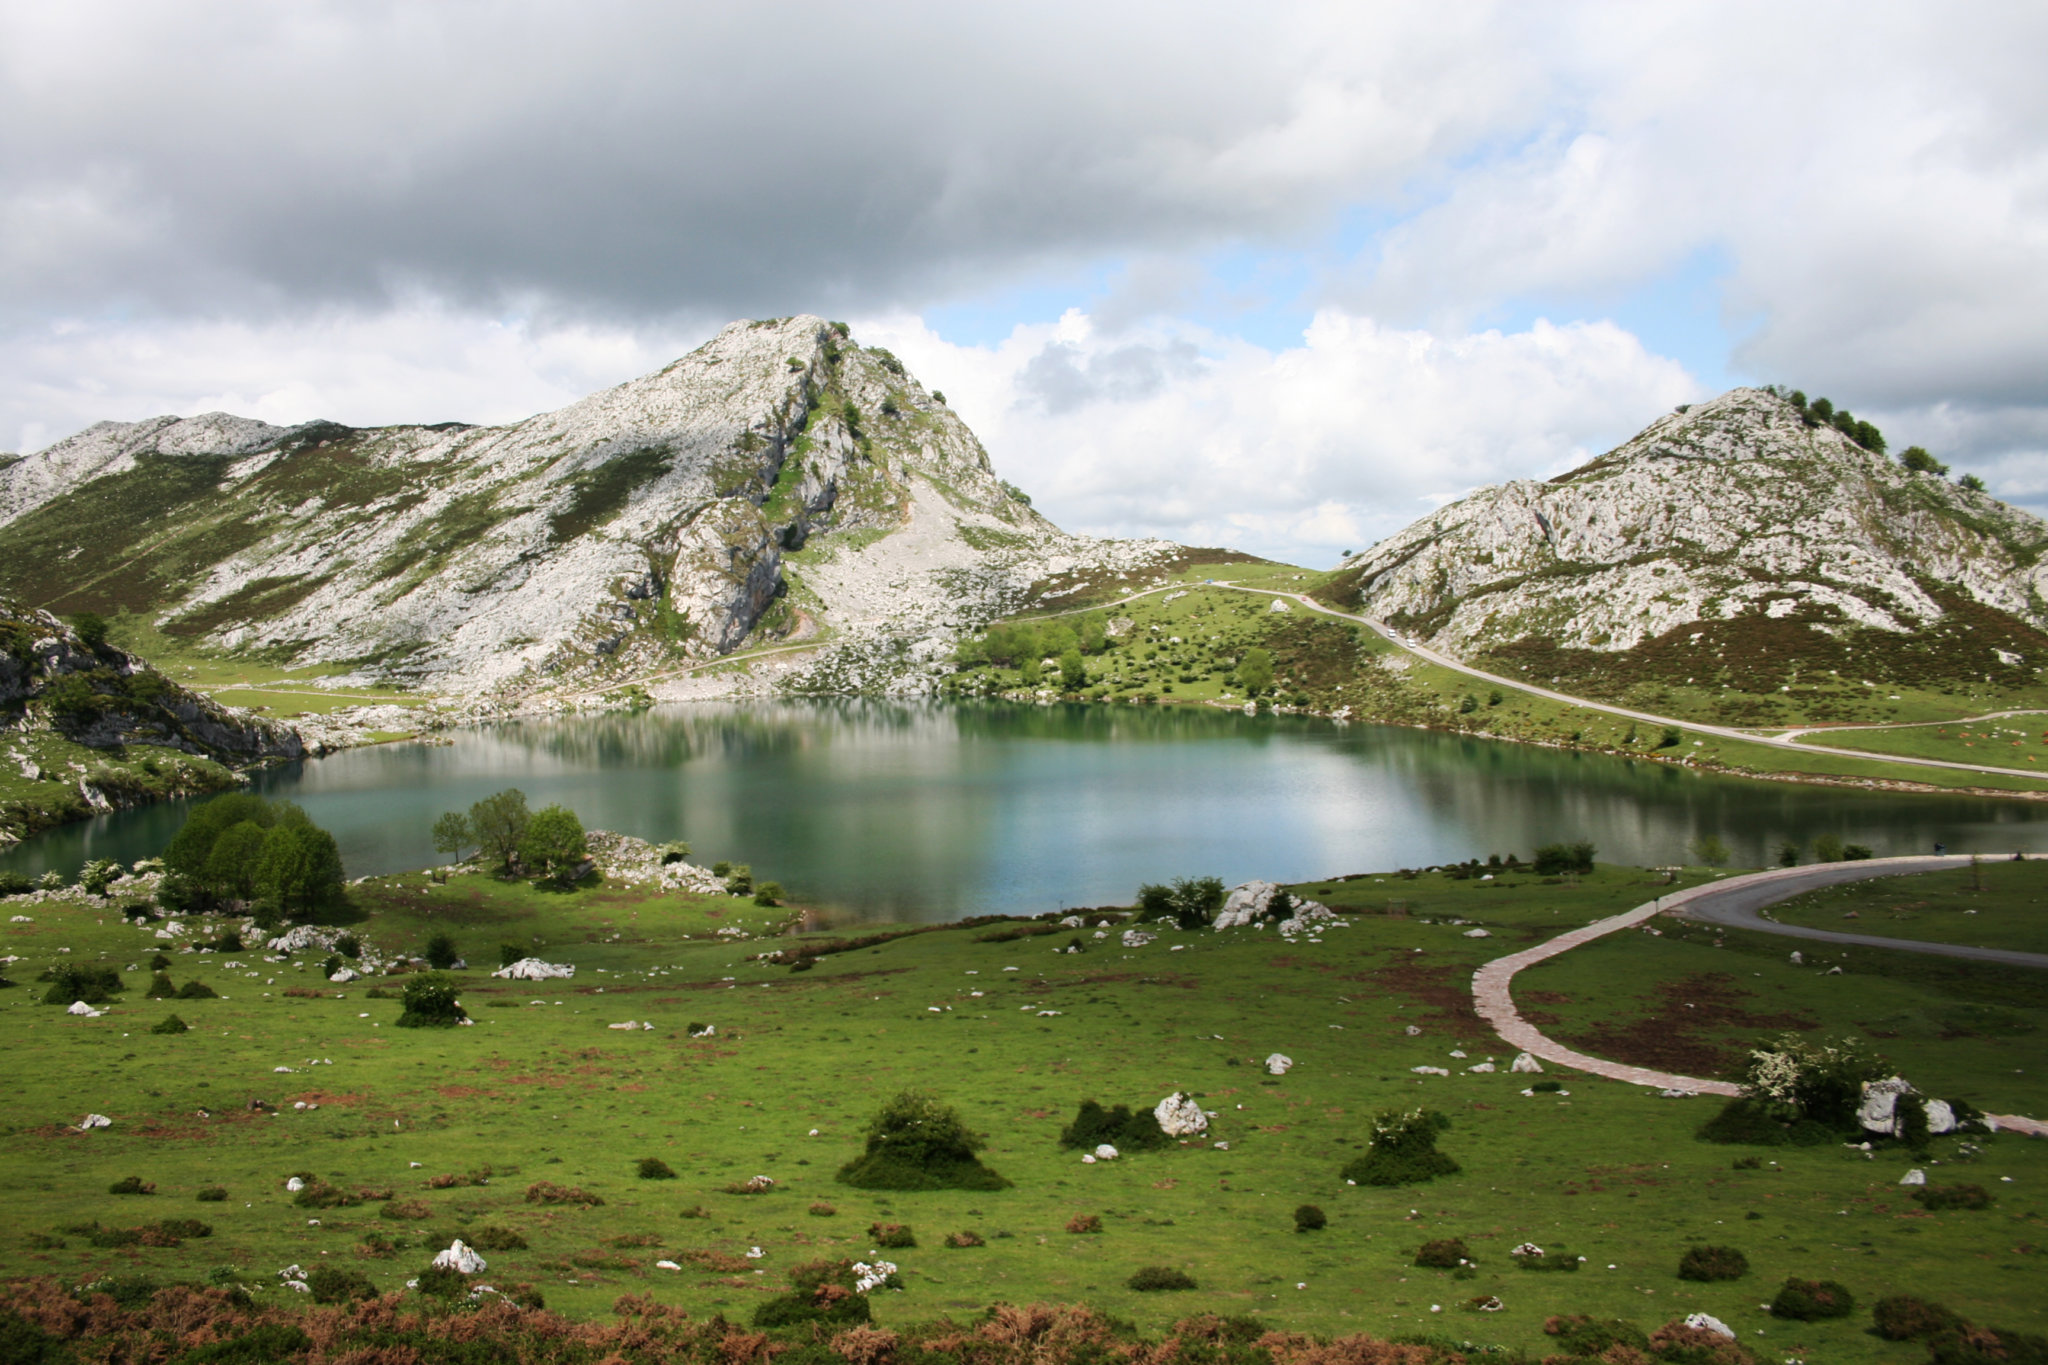 Lake enoll